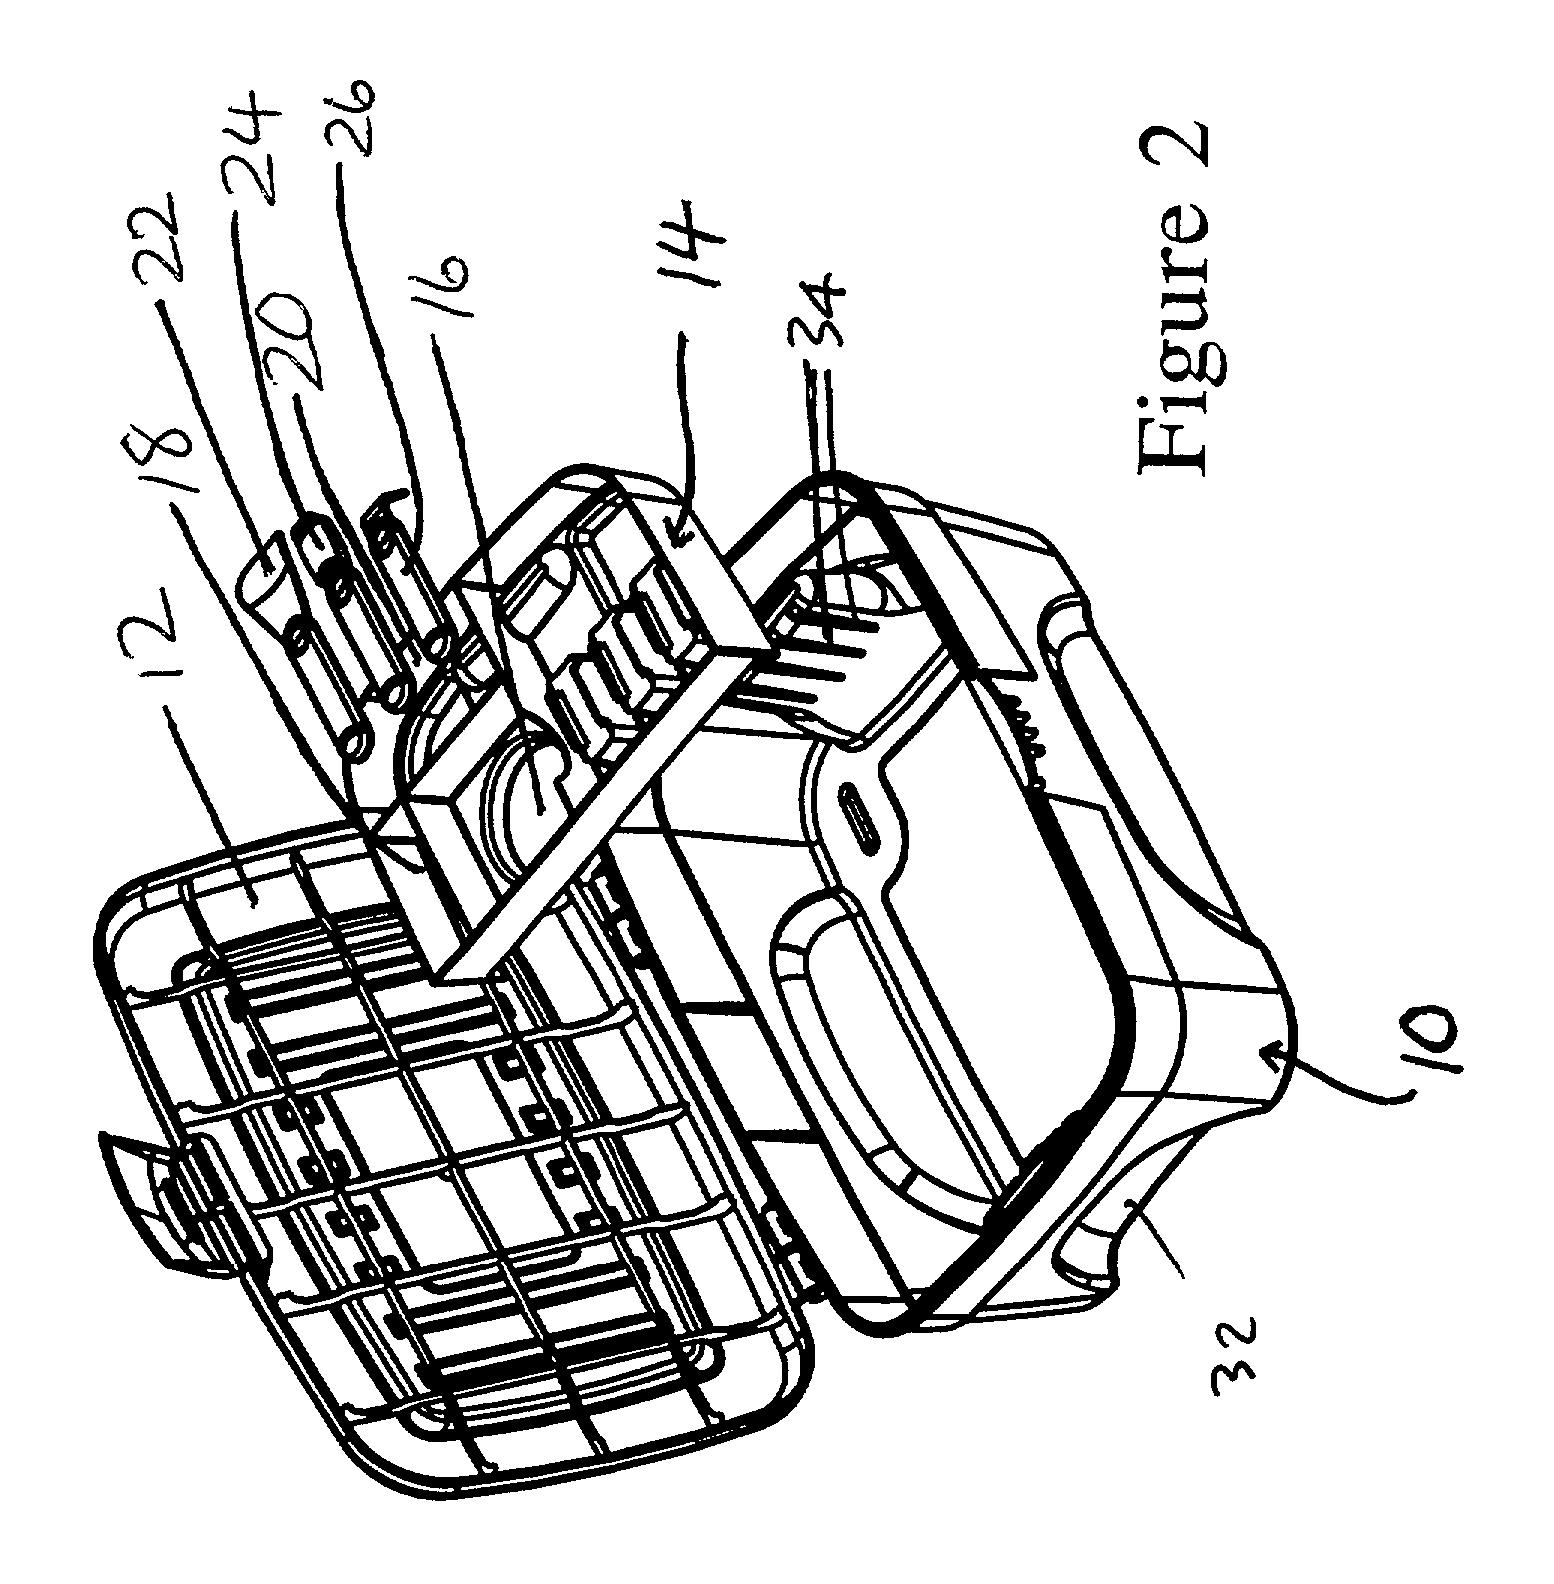 Wiring Hot Shoe, Wiring, Free Engine Image For User Manual